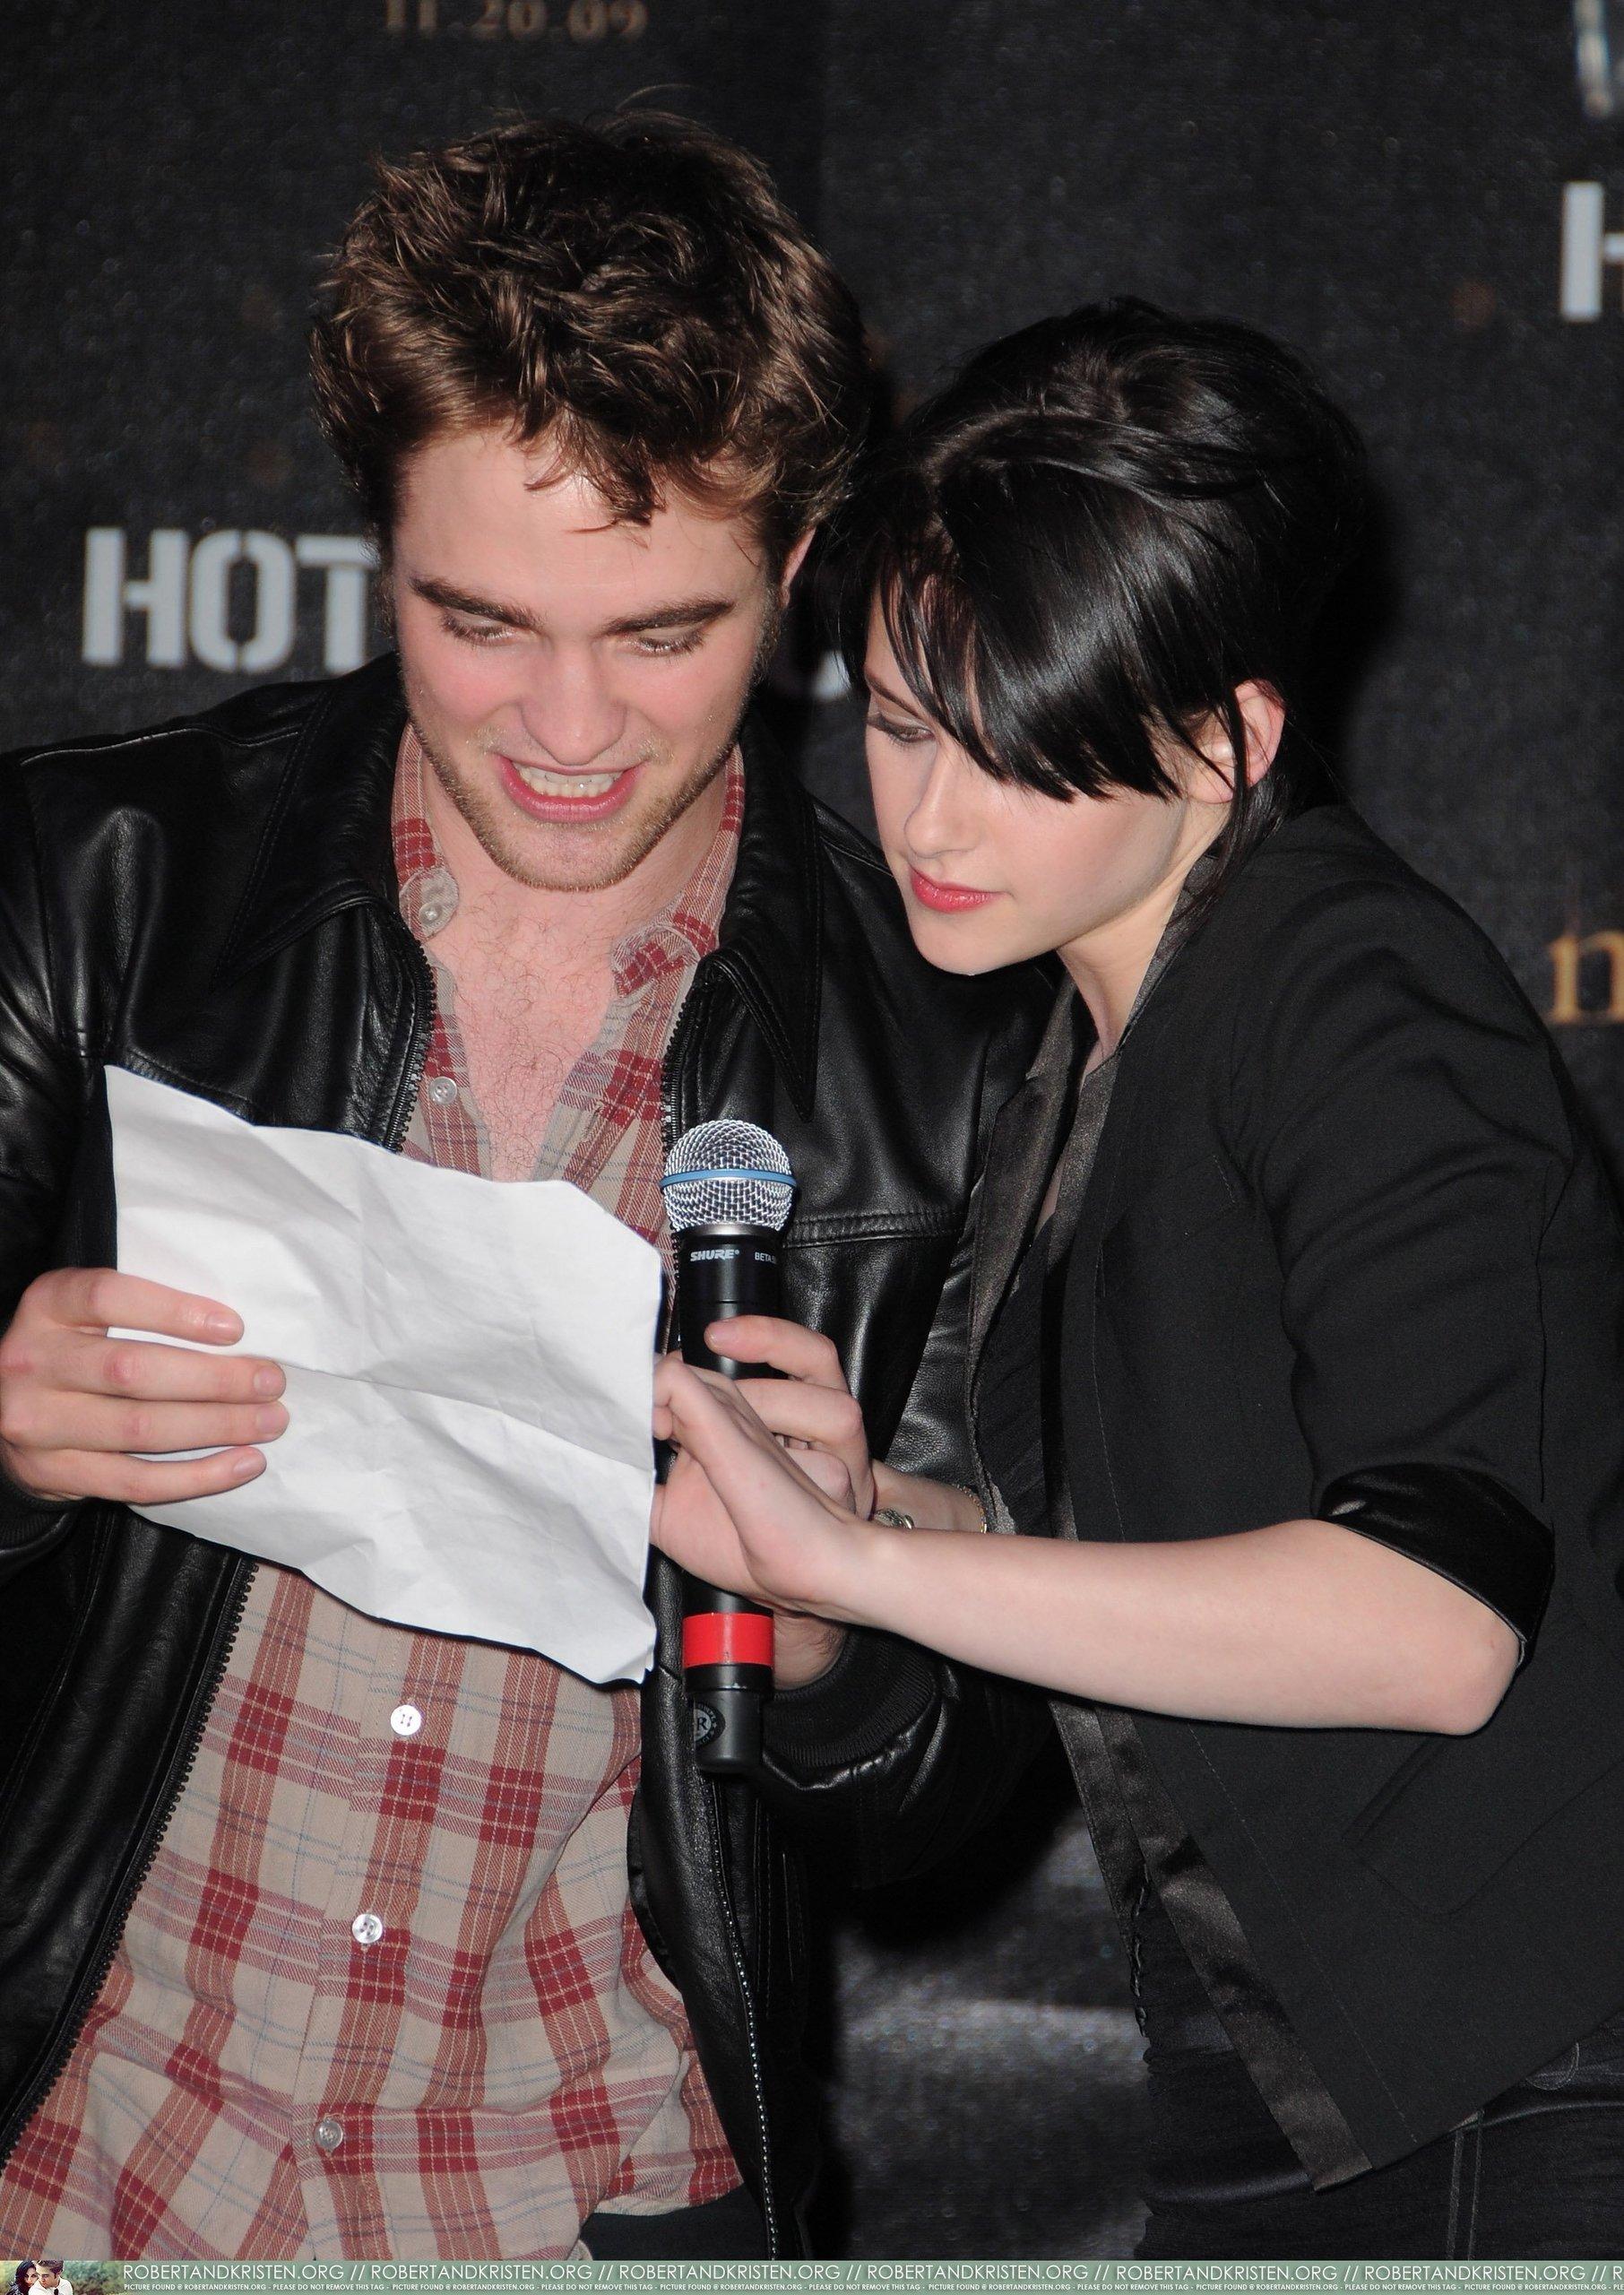 HQ تصاویر of Robert Pattinson at Hot Topic